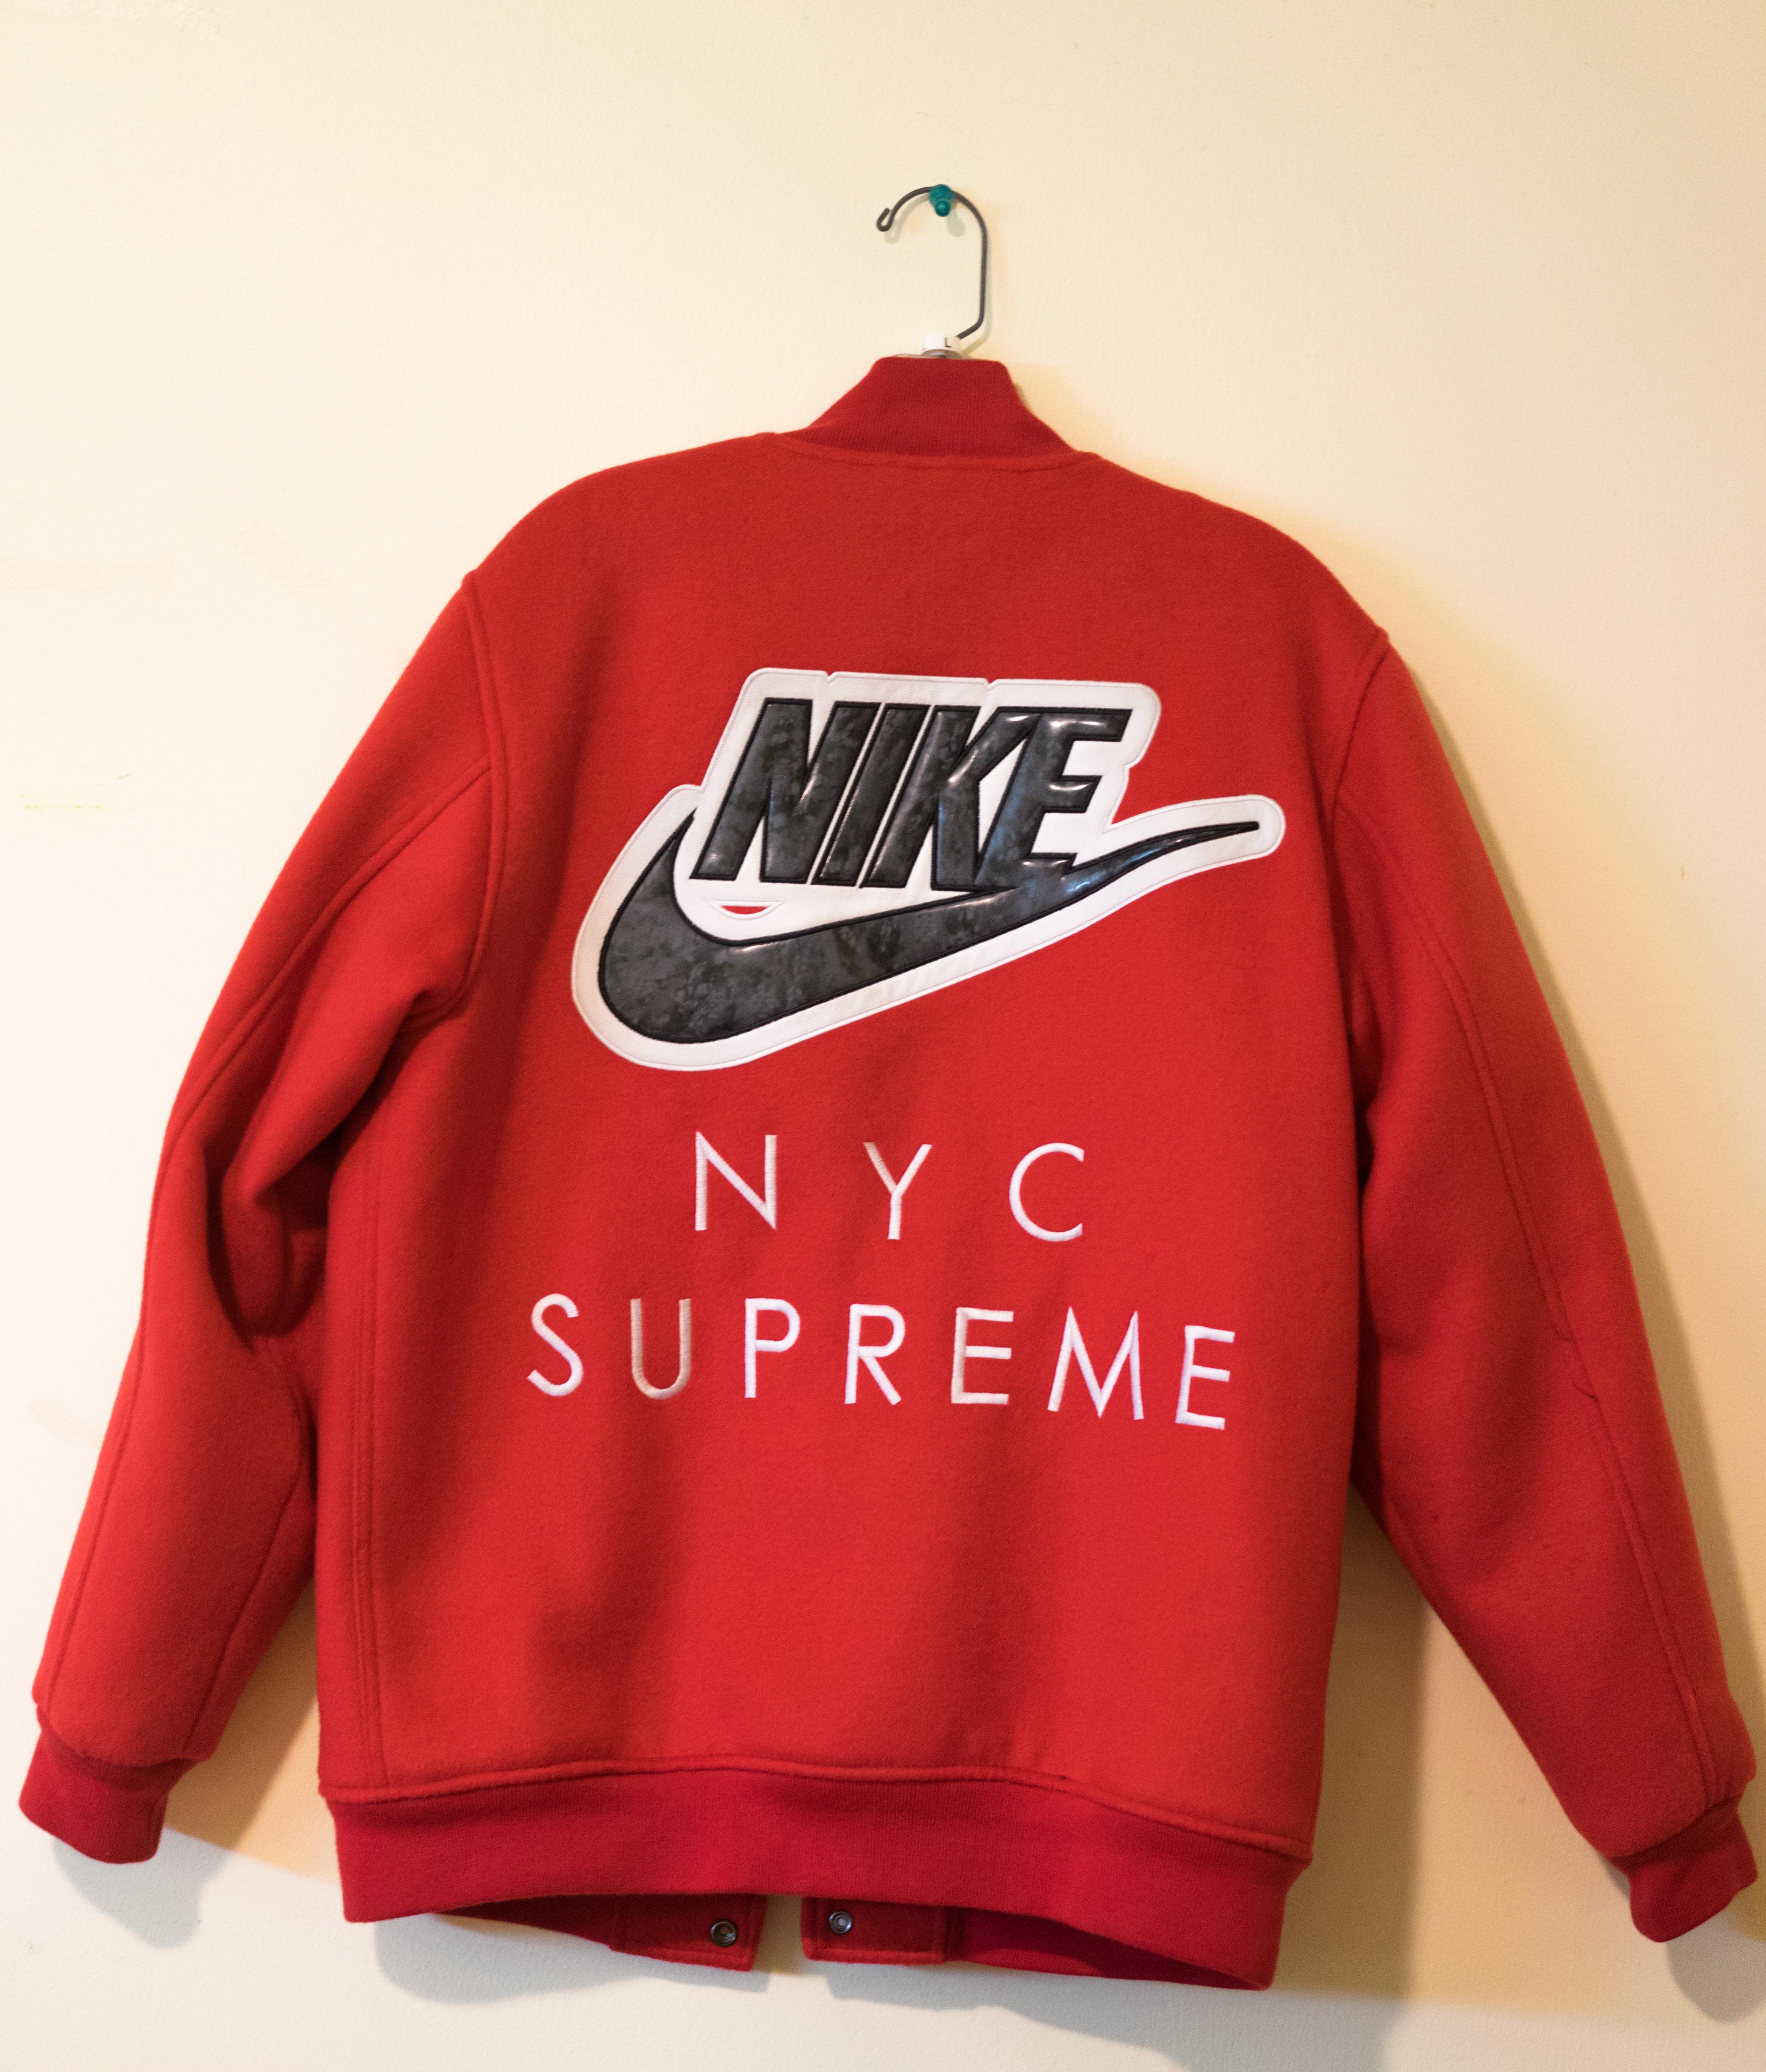 12125d6cf3bf Supreme Supreme X Nike SB Red Varsity Jacket 2007 Size m - Bombers ...